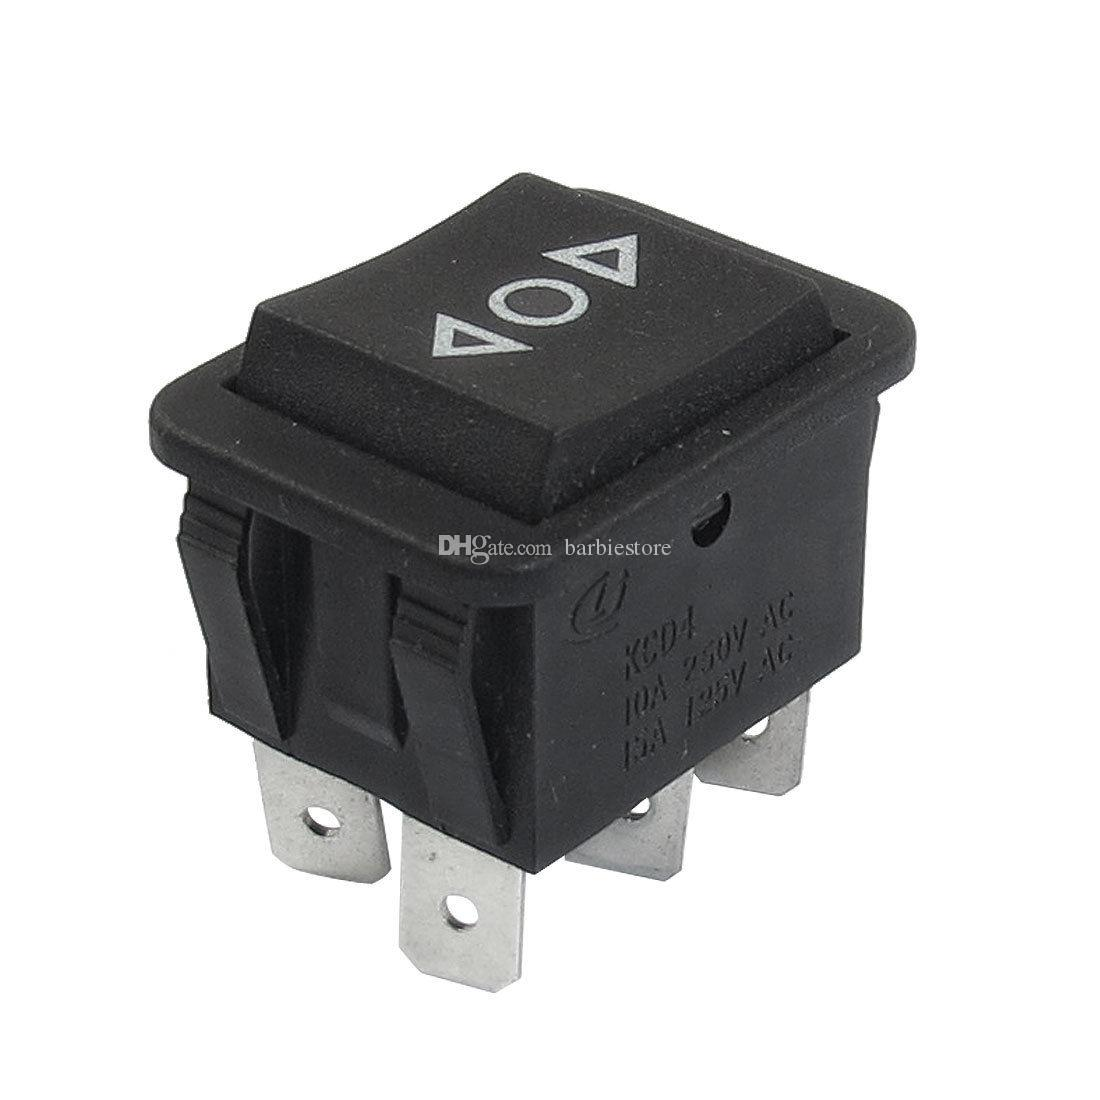 5X 6 Pin DPDT Botón negro On / Off / On Interruptor basculante AC 250V / 10A 125V / 15A B00403